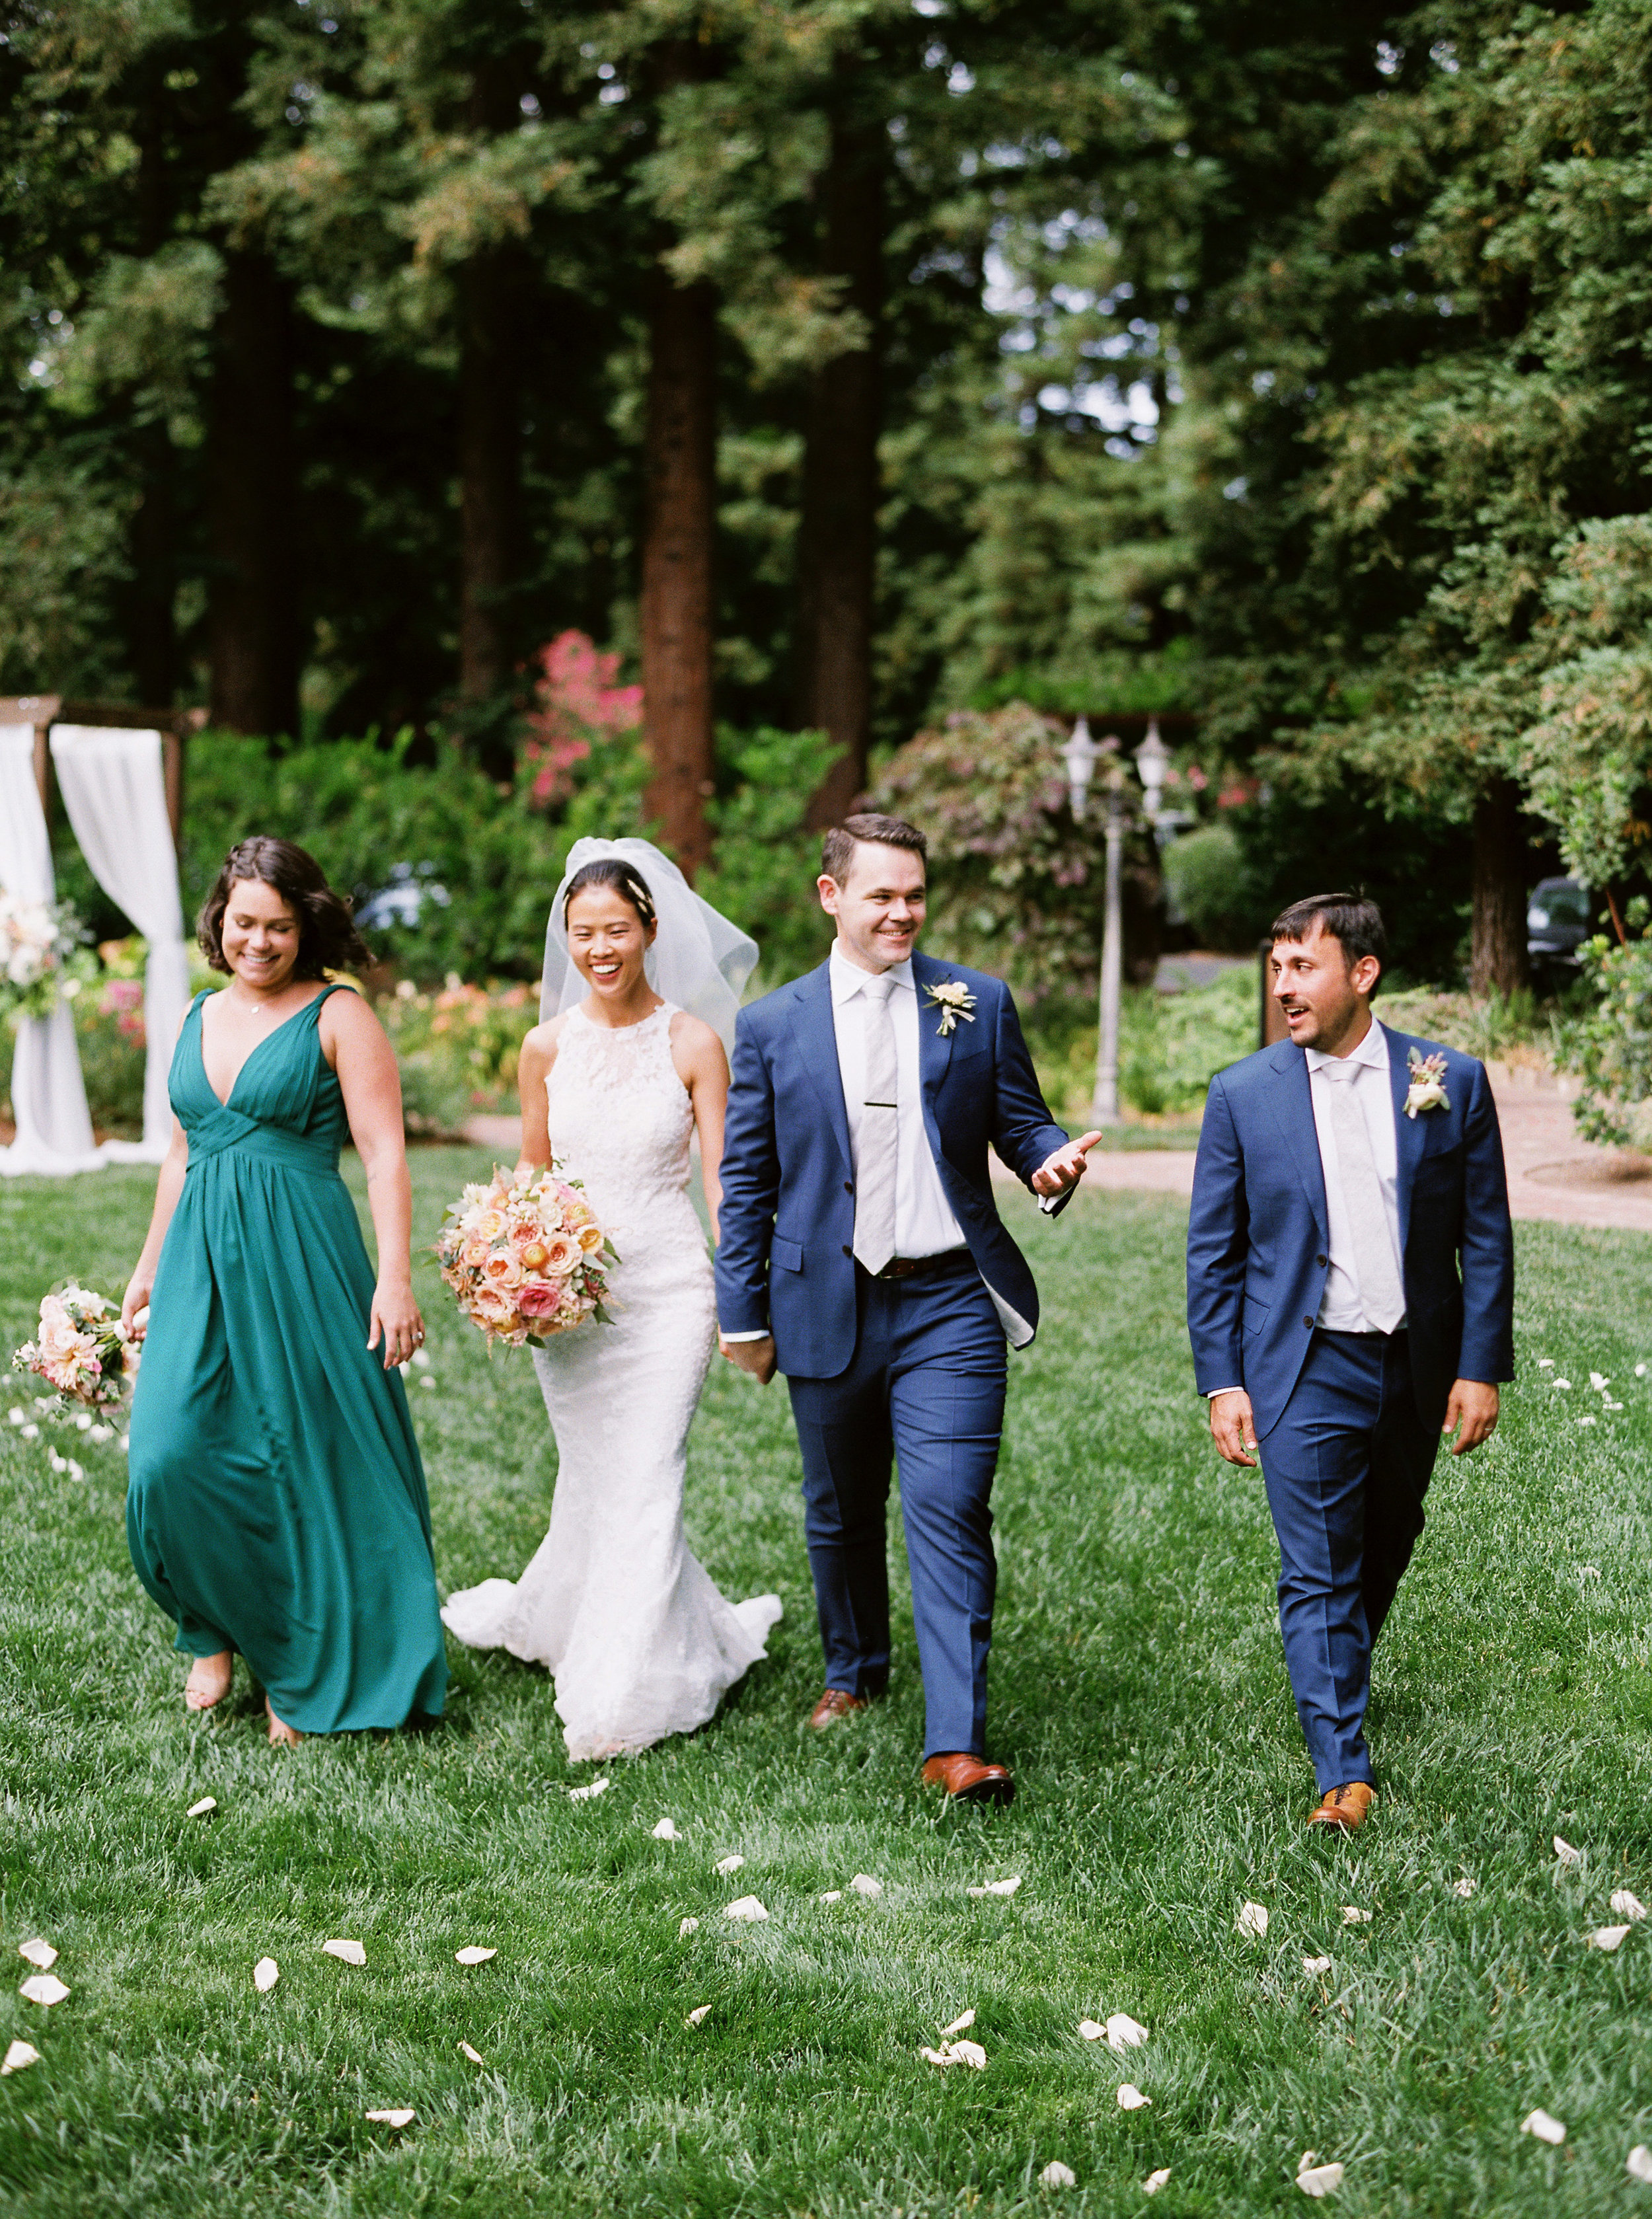 Harvest-inn-wedding-in-napa-california-50.jpg